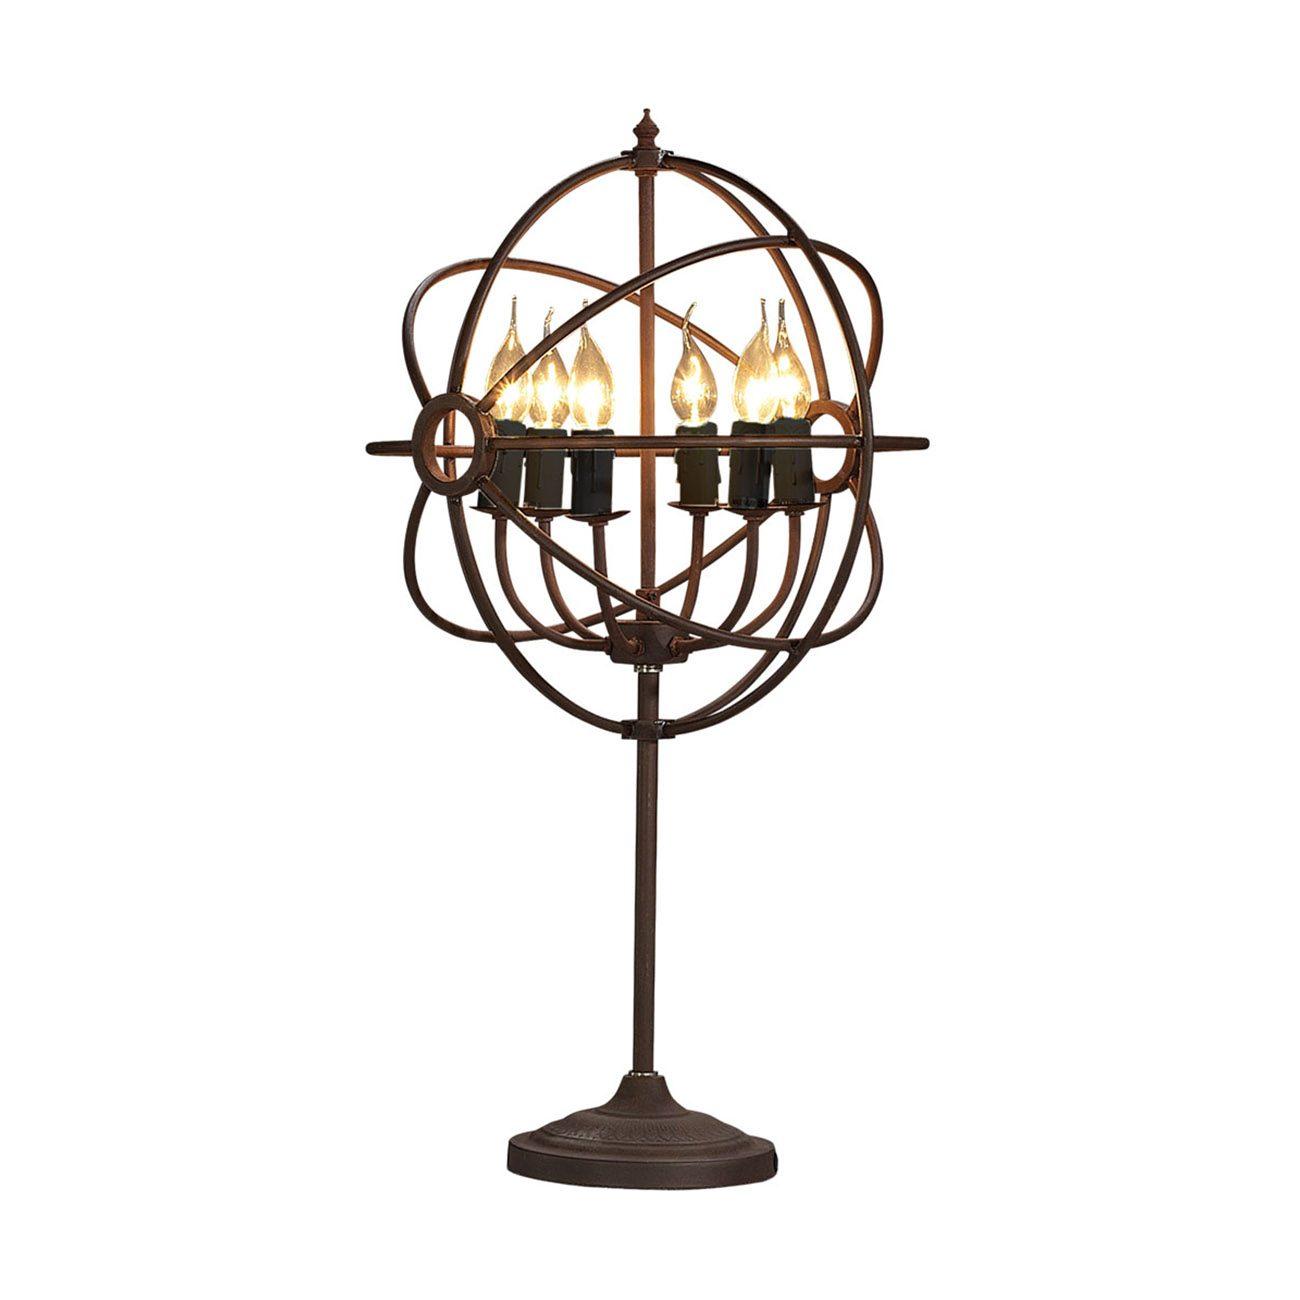 Gyro bordslampa ljuskrona rost antik ifrån Artwood